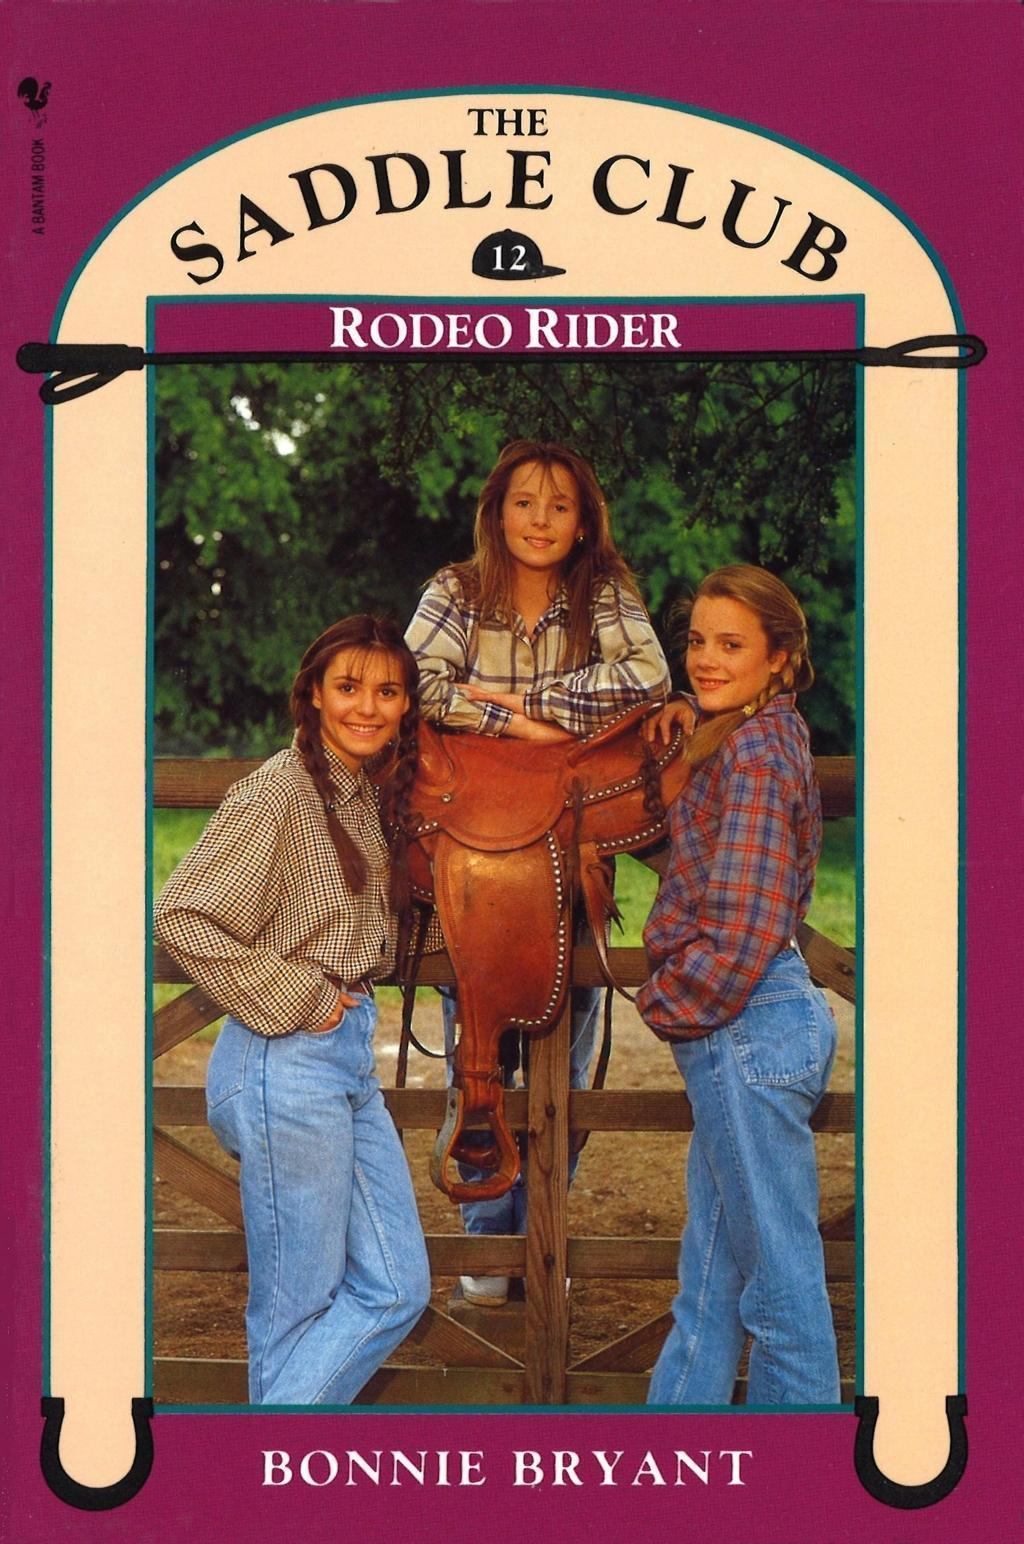 Saddle Club Book 12: Rodeo Rider